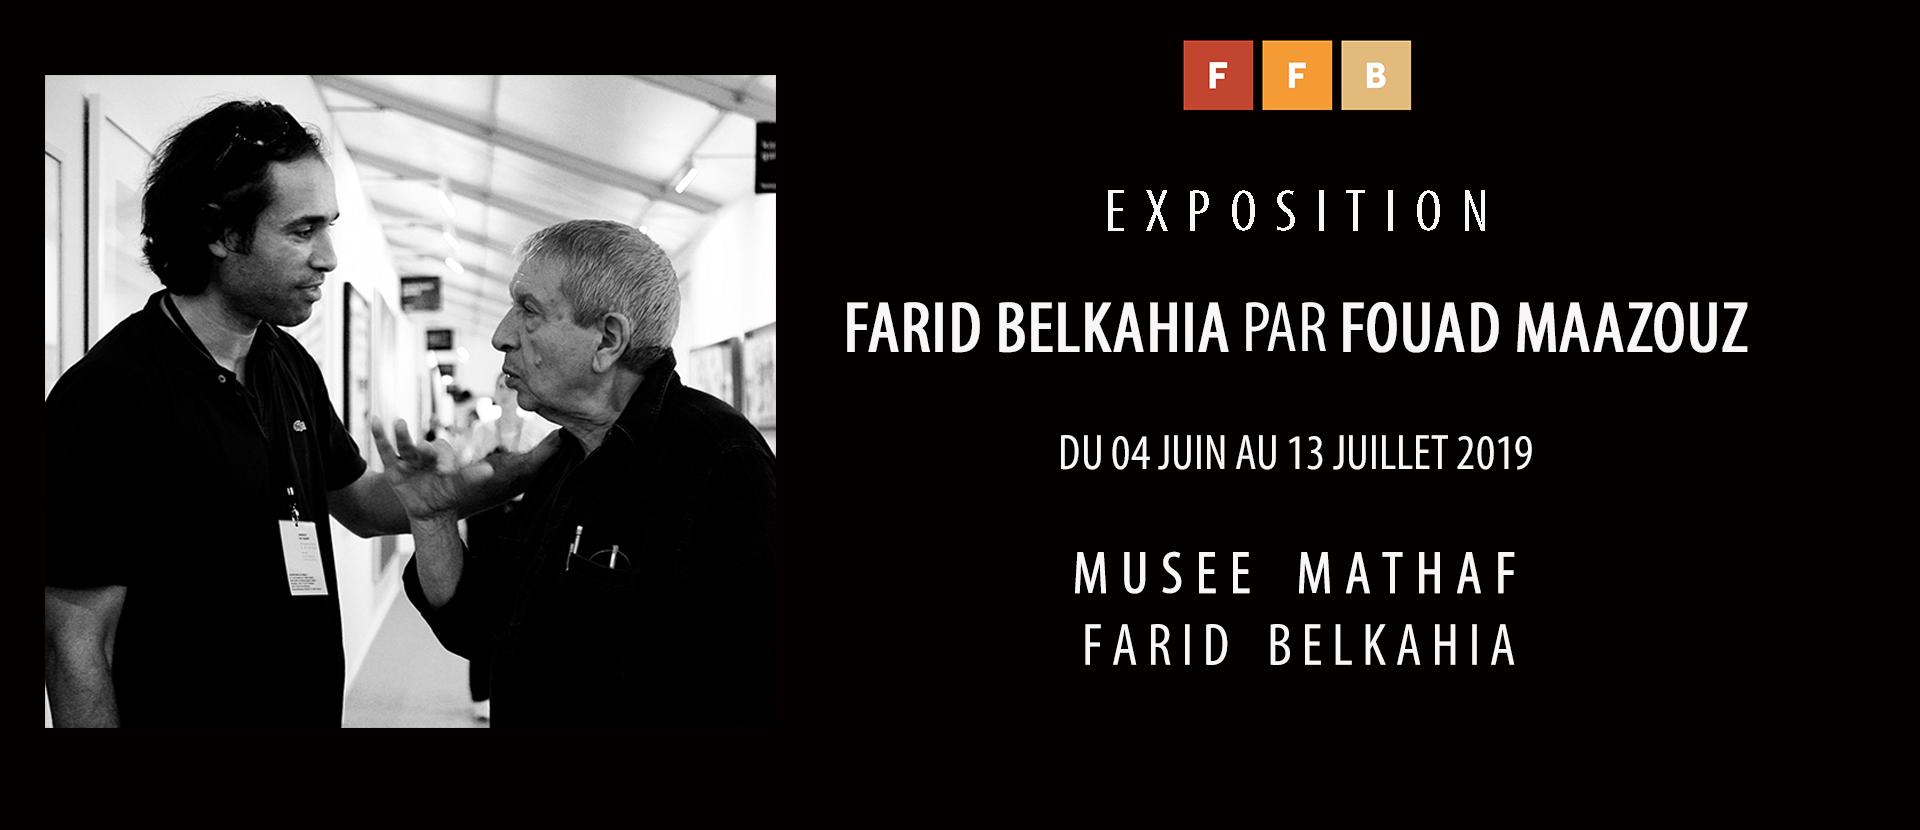 EXPOSITION : FARID BELKAHIA PAR FOUAD MAAZOUZ DU 4 JUIN AU 13 JUILLET 2019